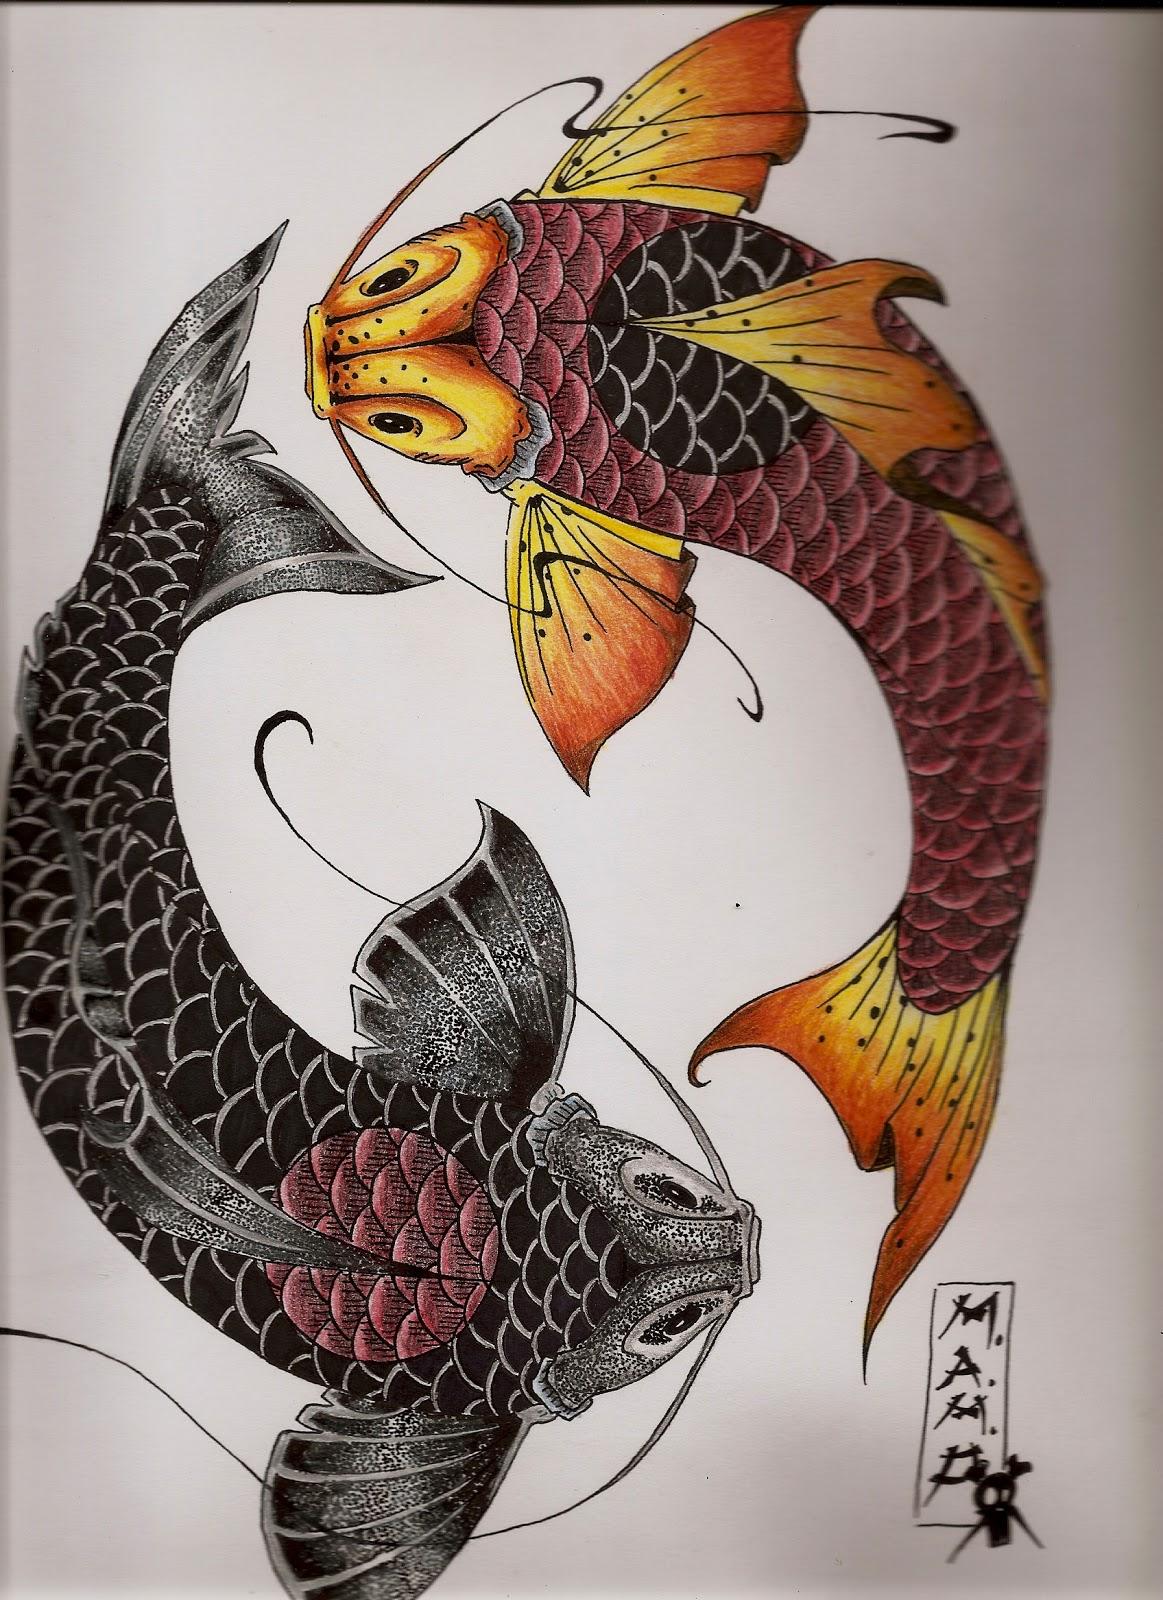 Worksheet. Marniox Art Boceto 1 peces koi ying yang